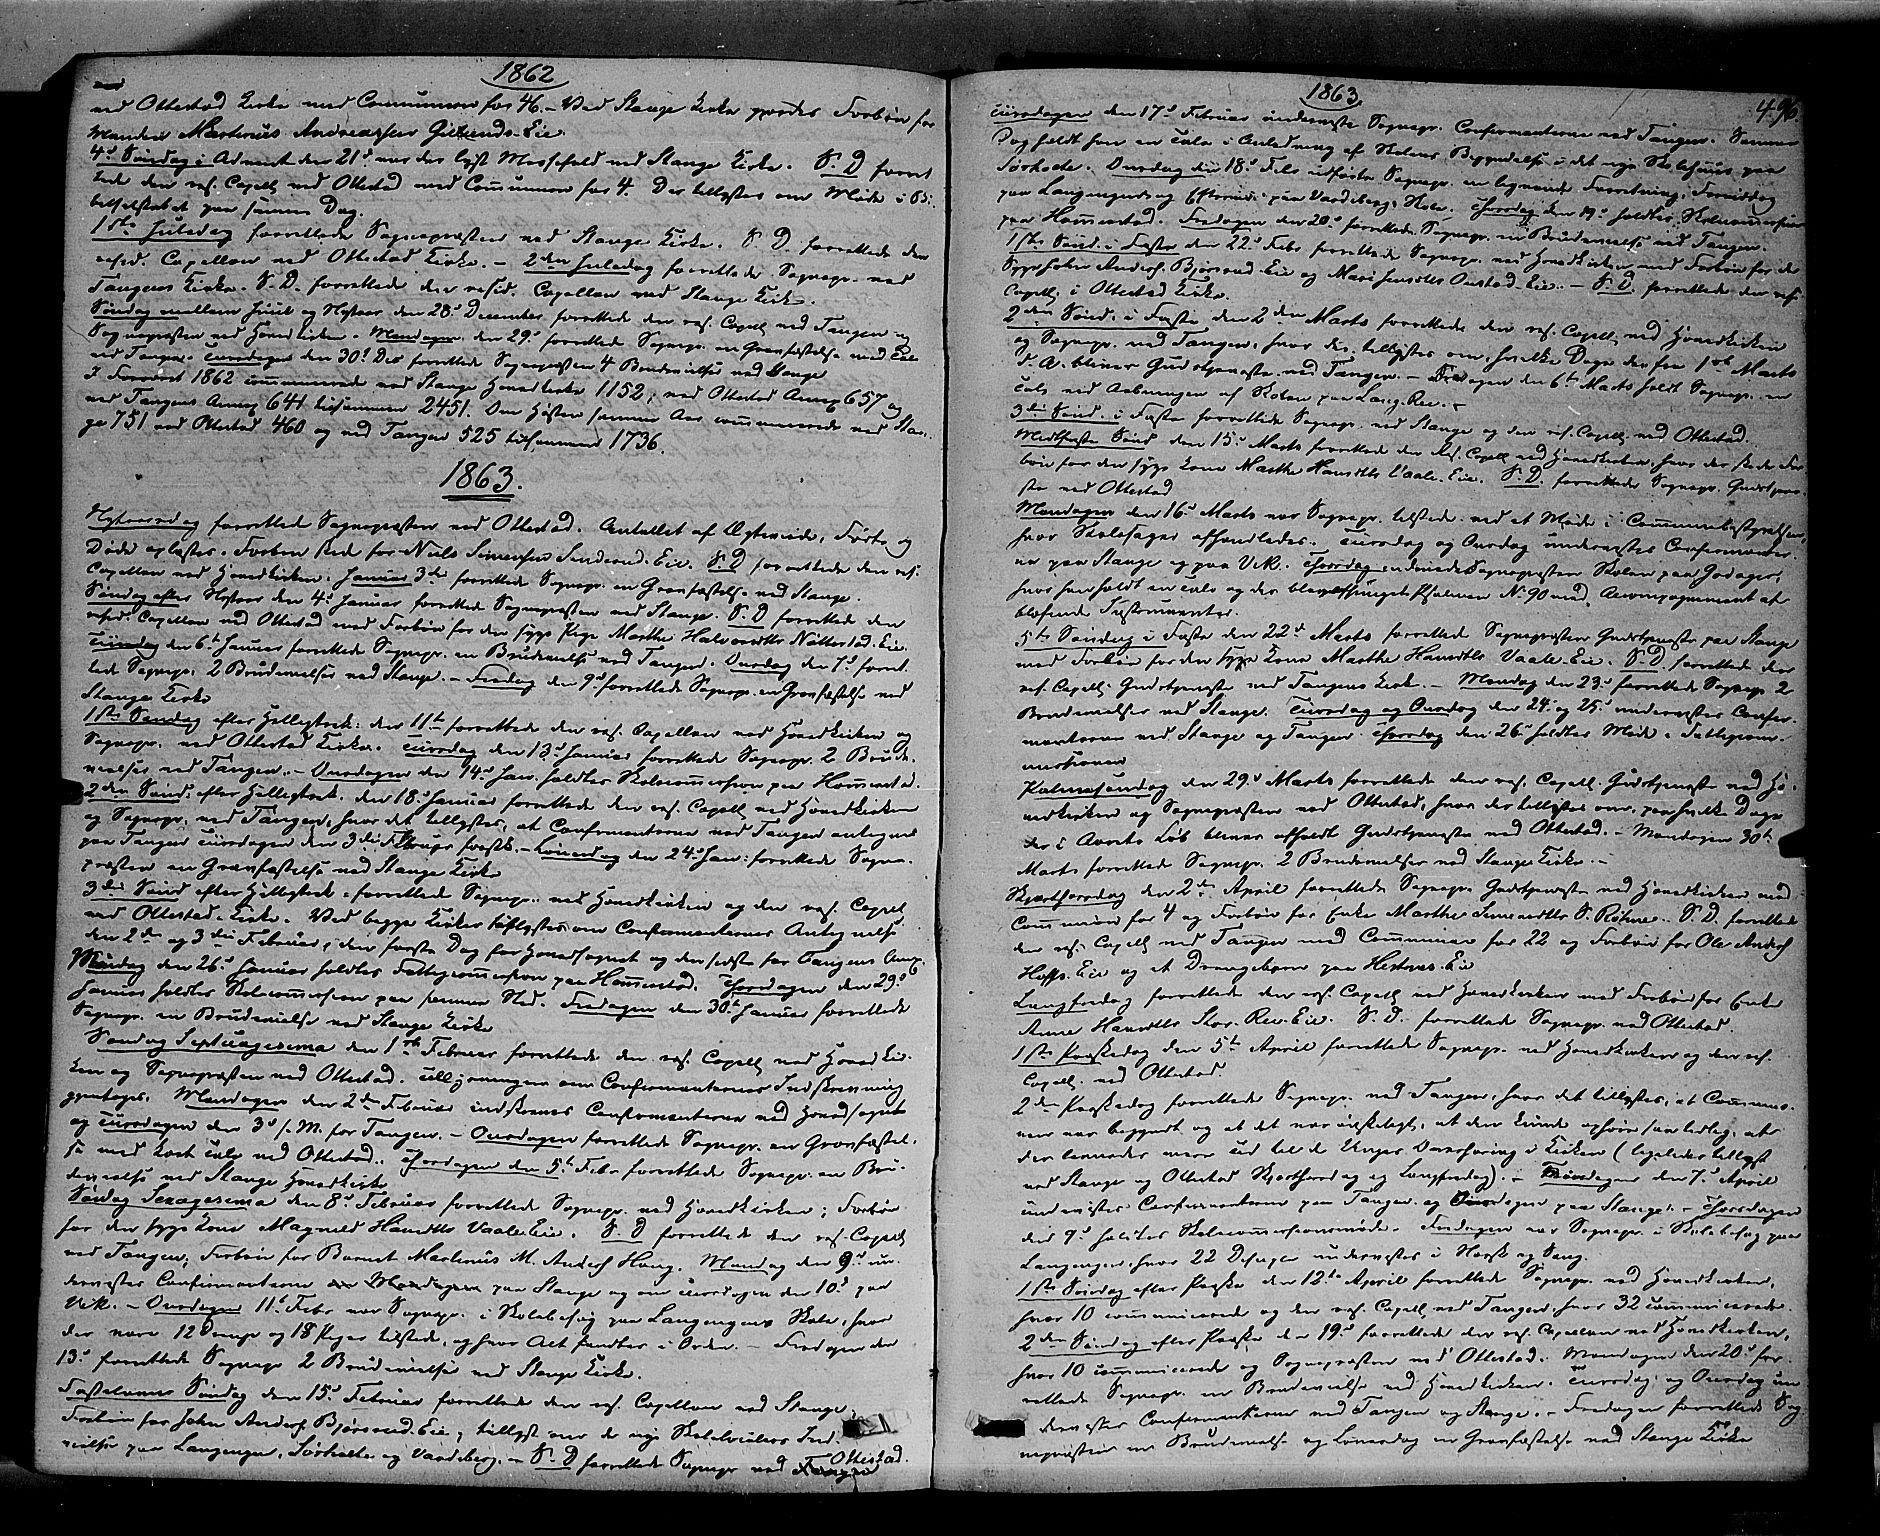 SAH, Stange prestekontor, K/L0013: Ministerialbok nr. 13, 1862-1879, s. 496